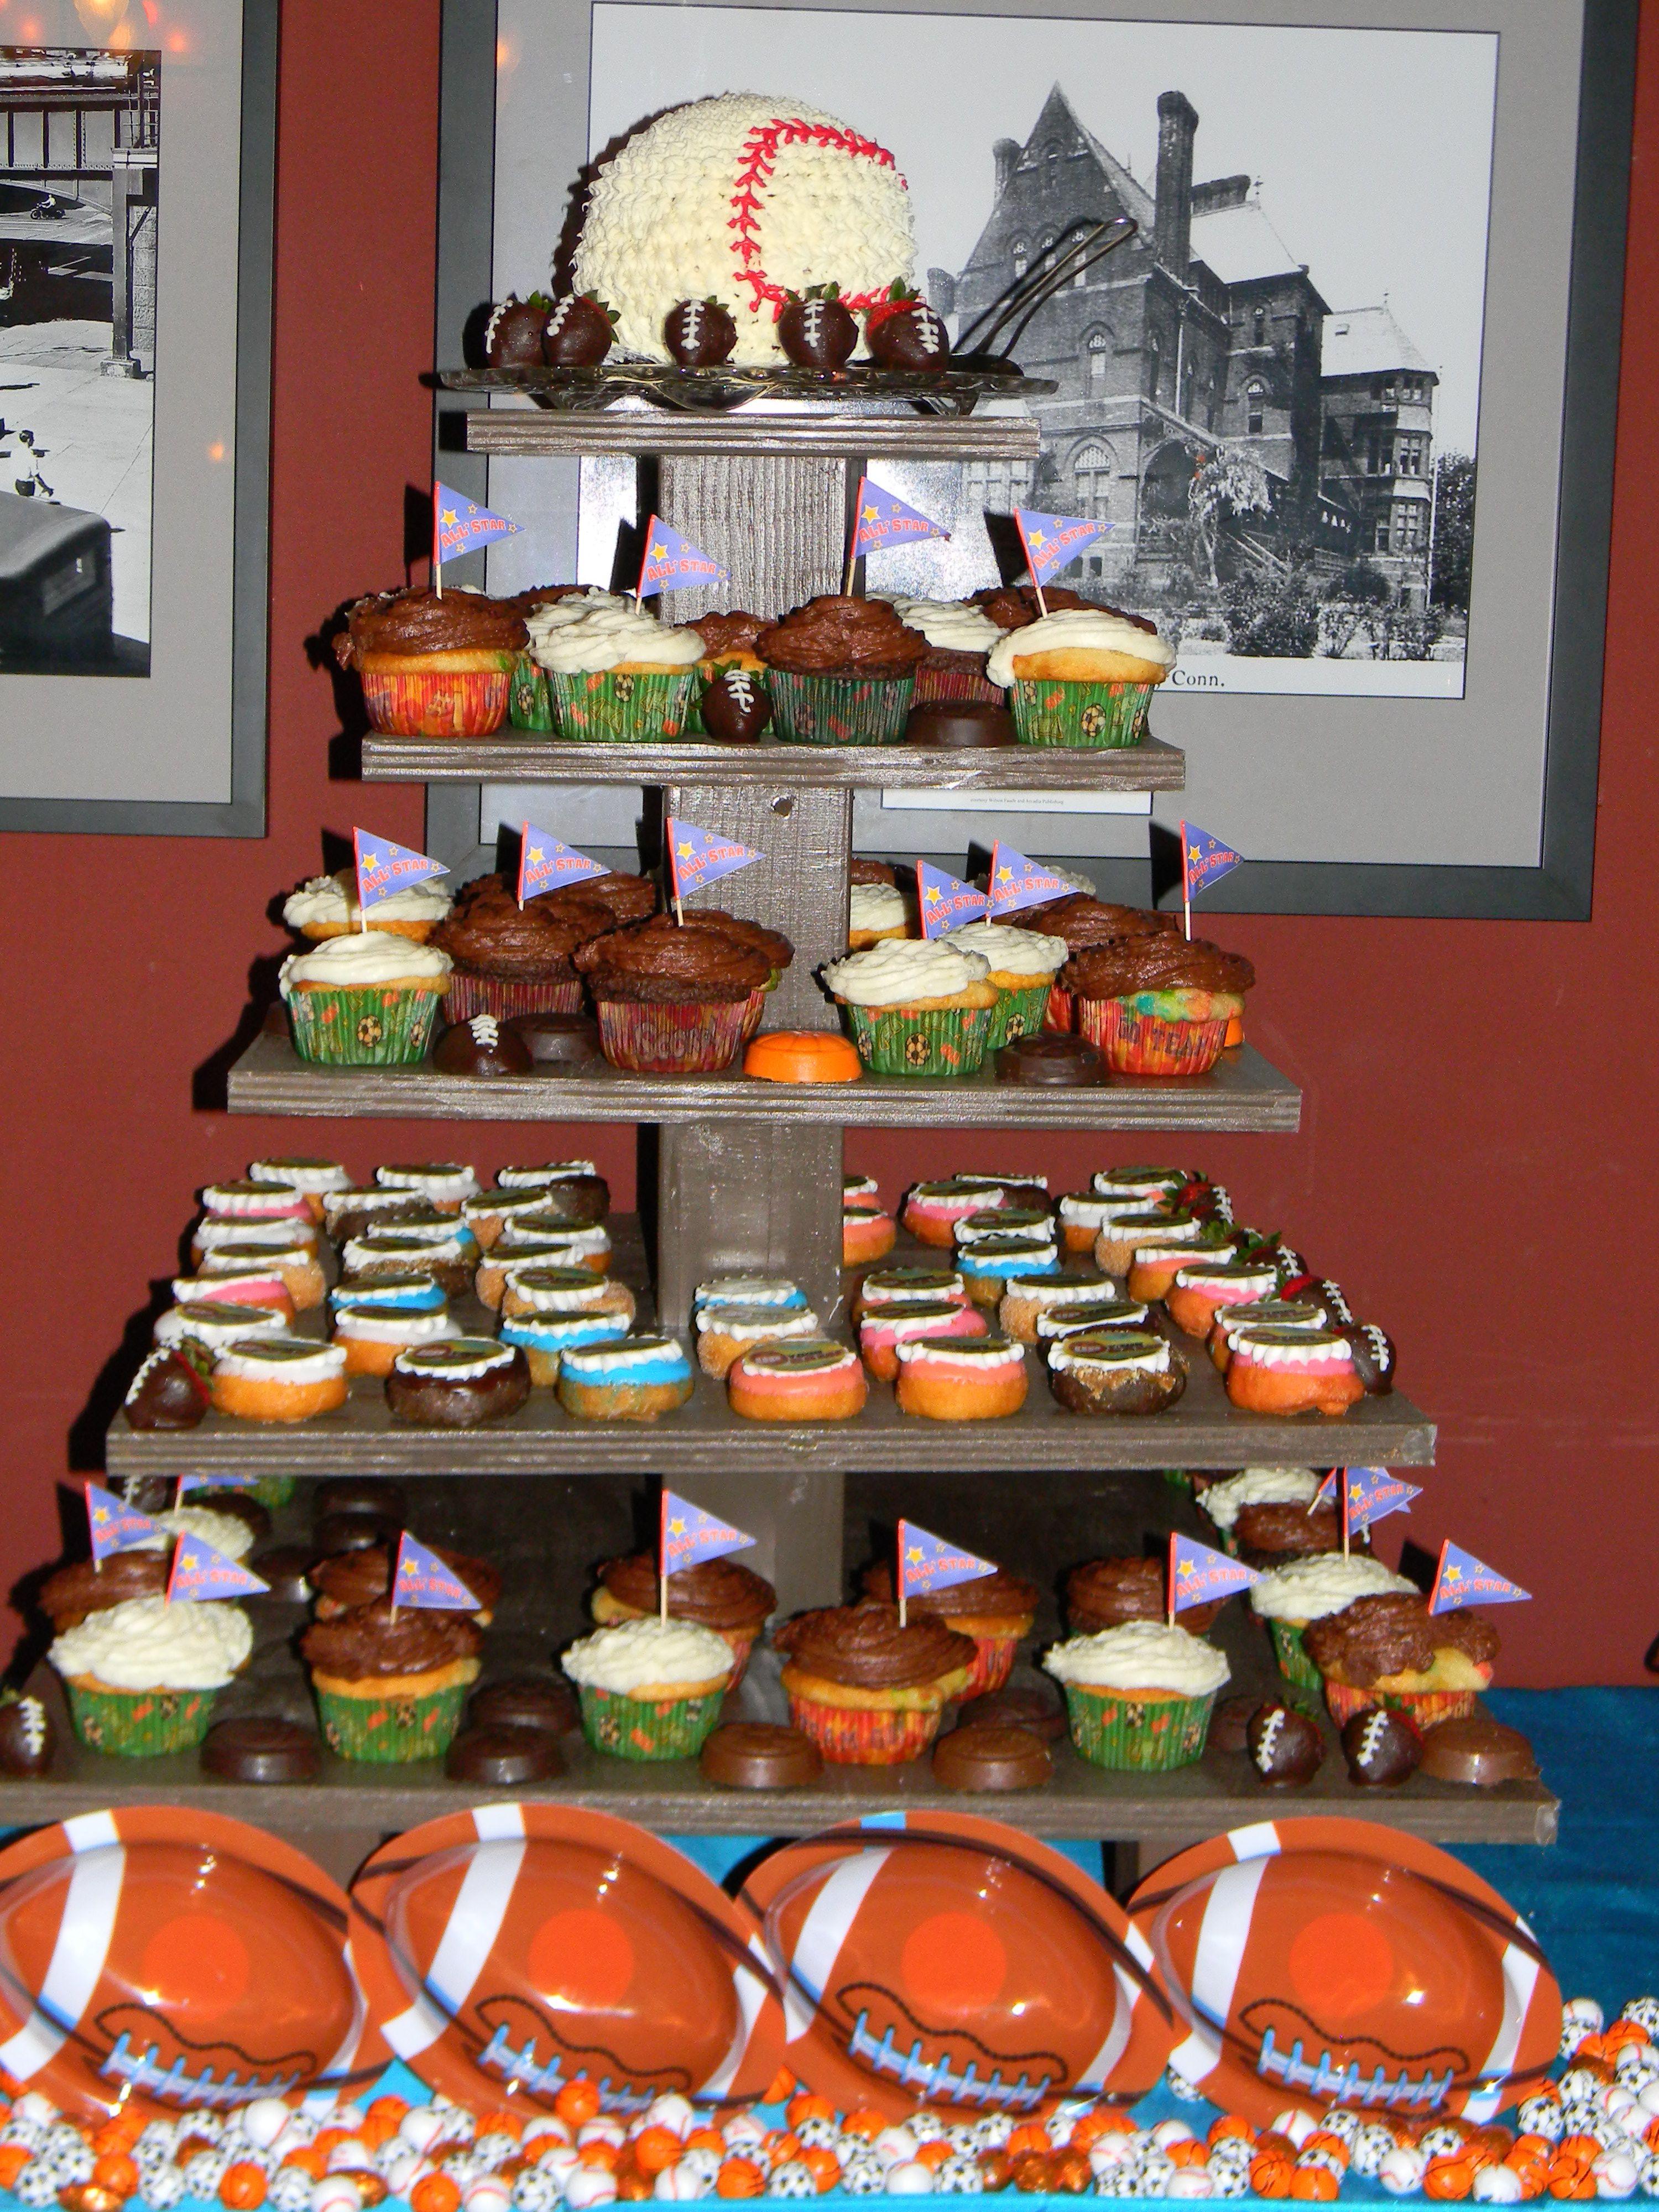 Sports Themed Dessert Tower